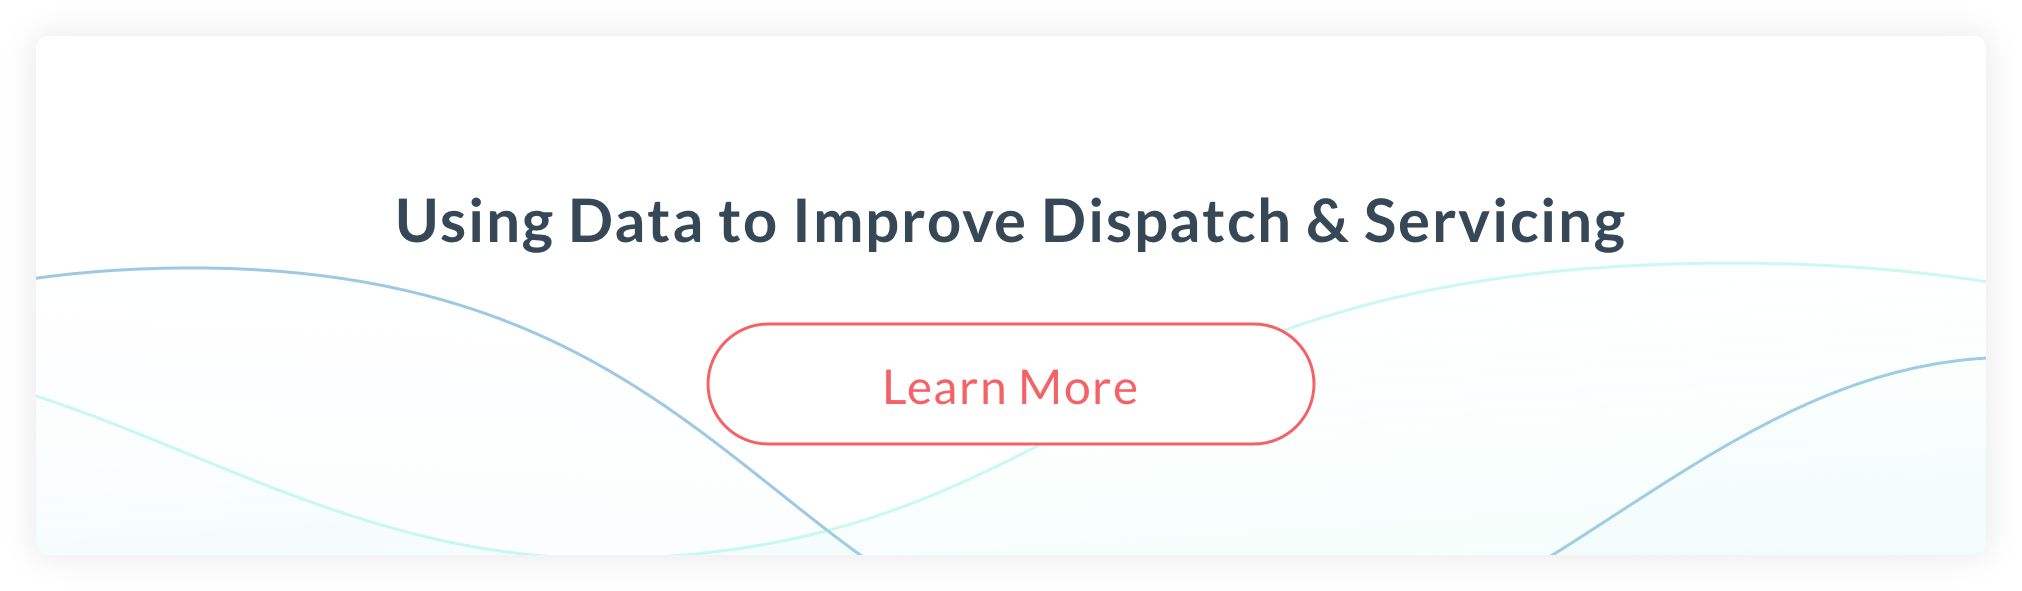 Optimizing Dispatch & Servicing